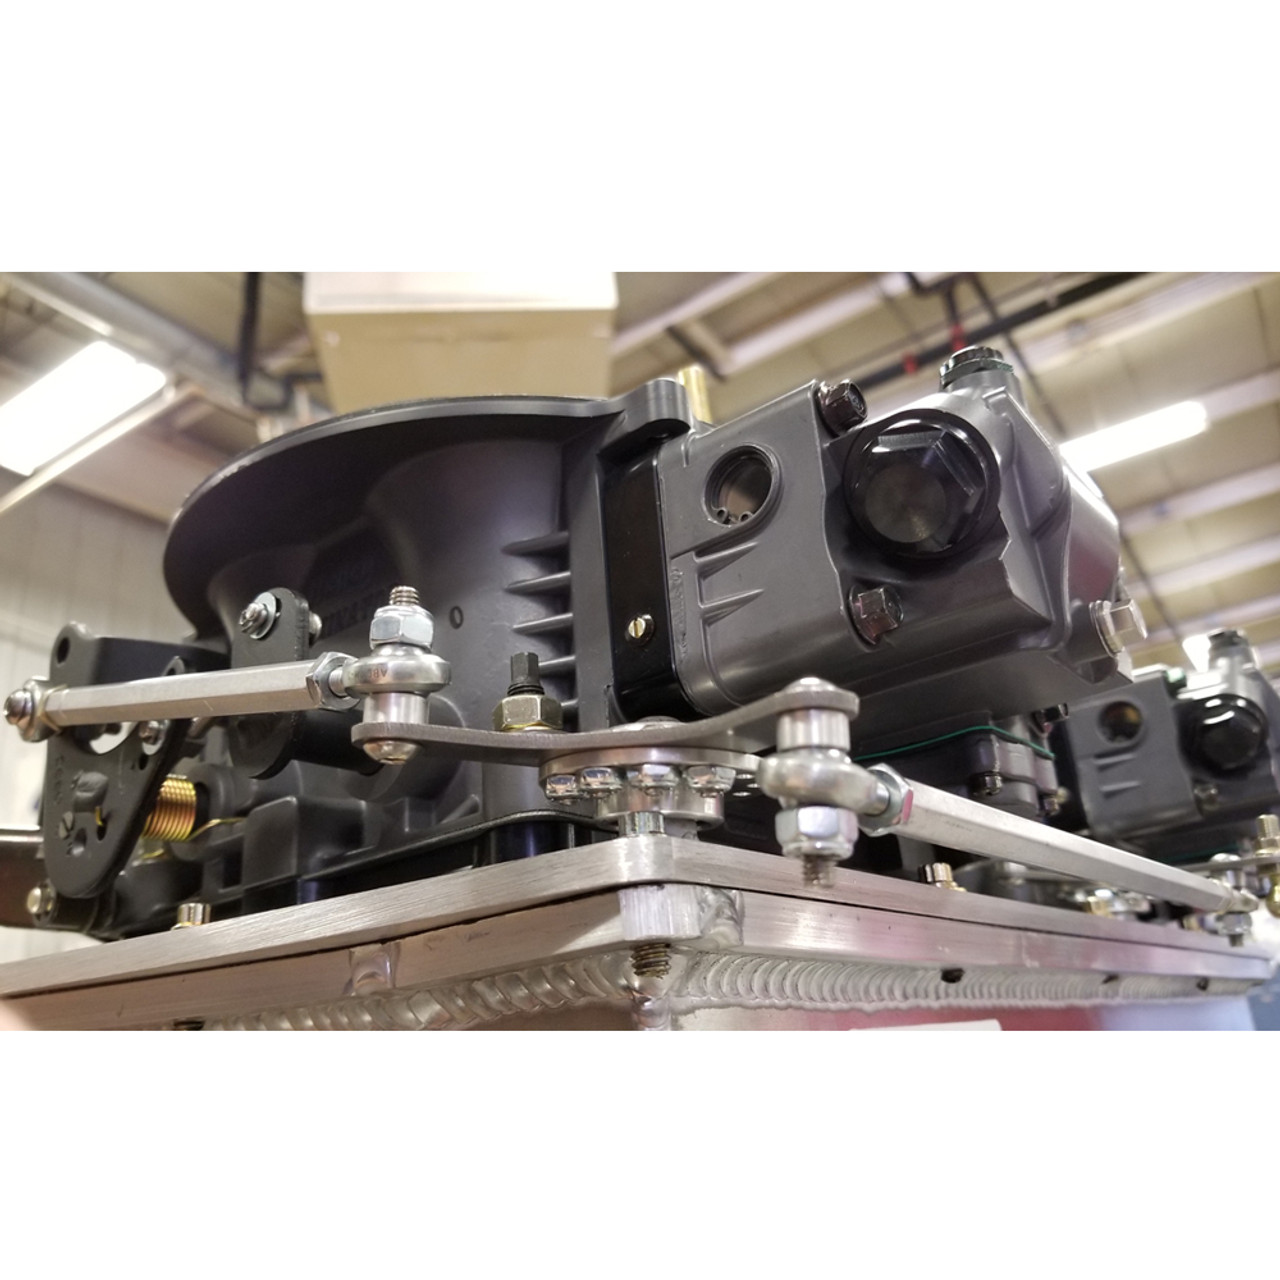 Bell Crank Linkage : Single bell crank throttle linkage kit quarter max